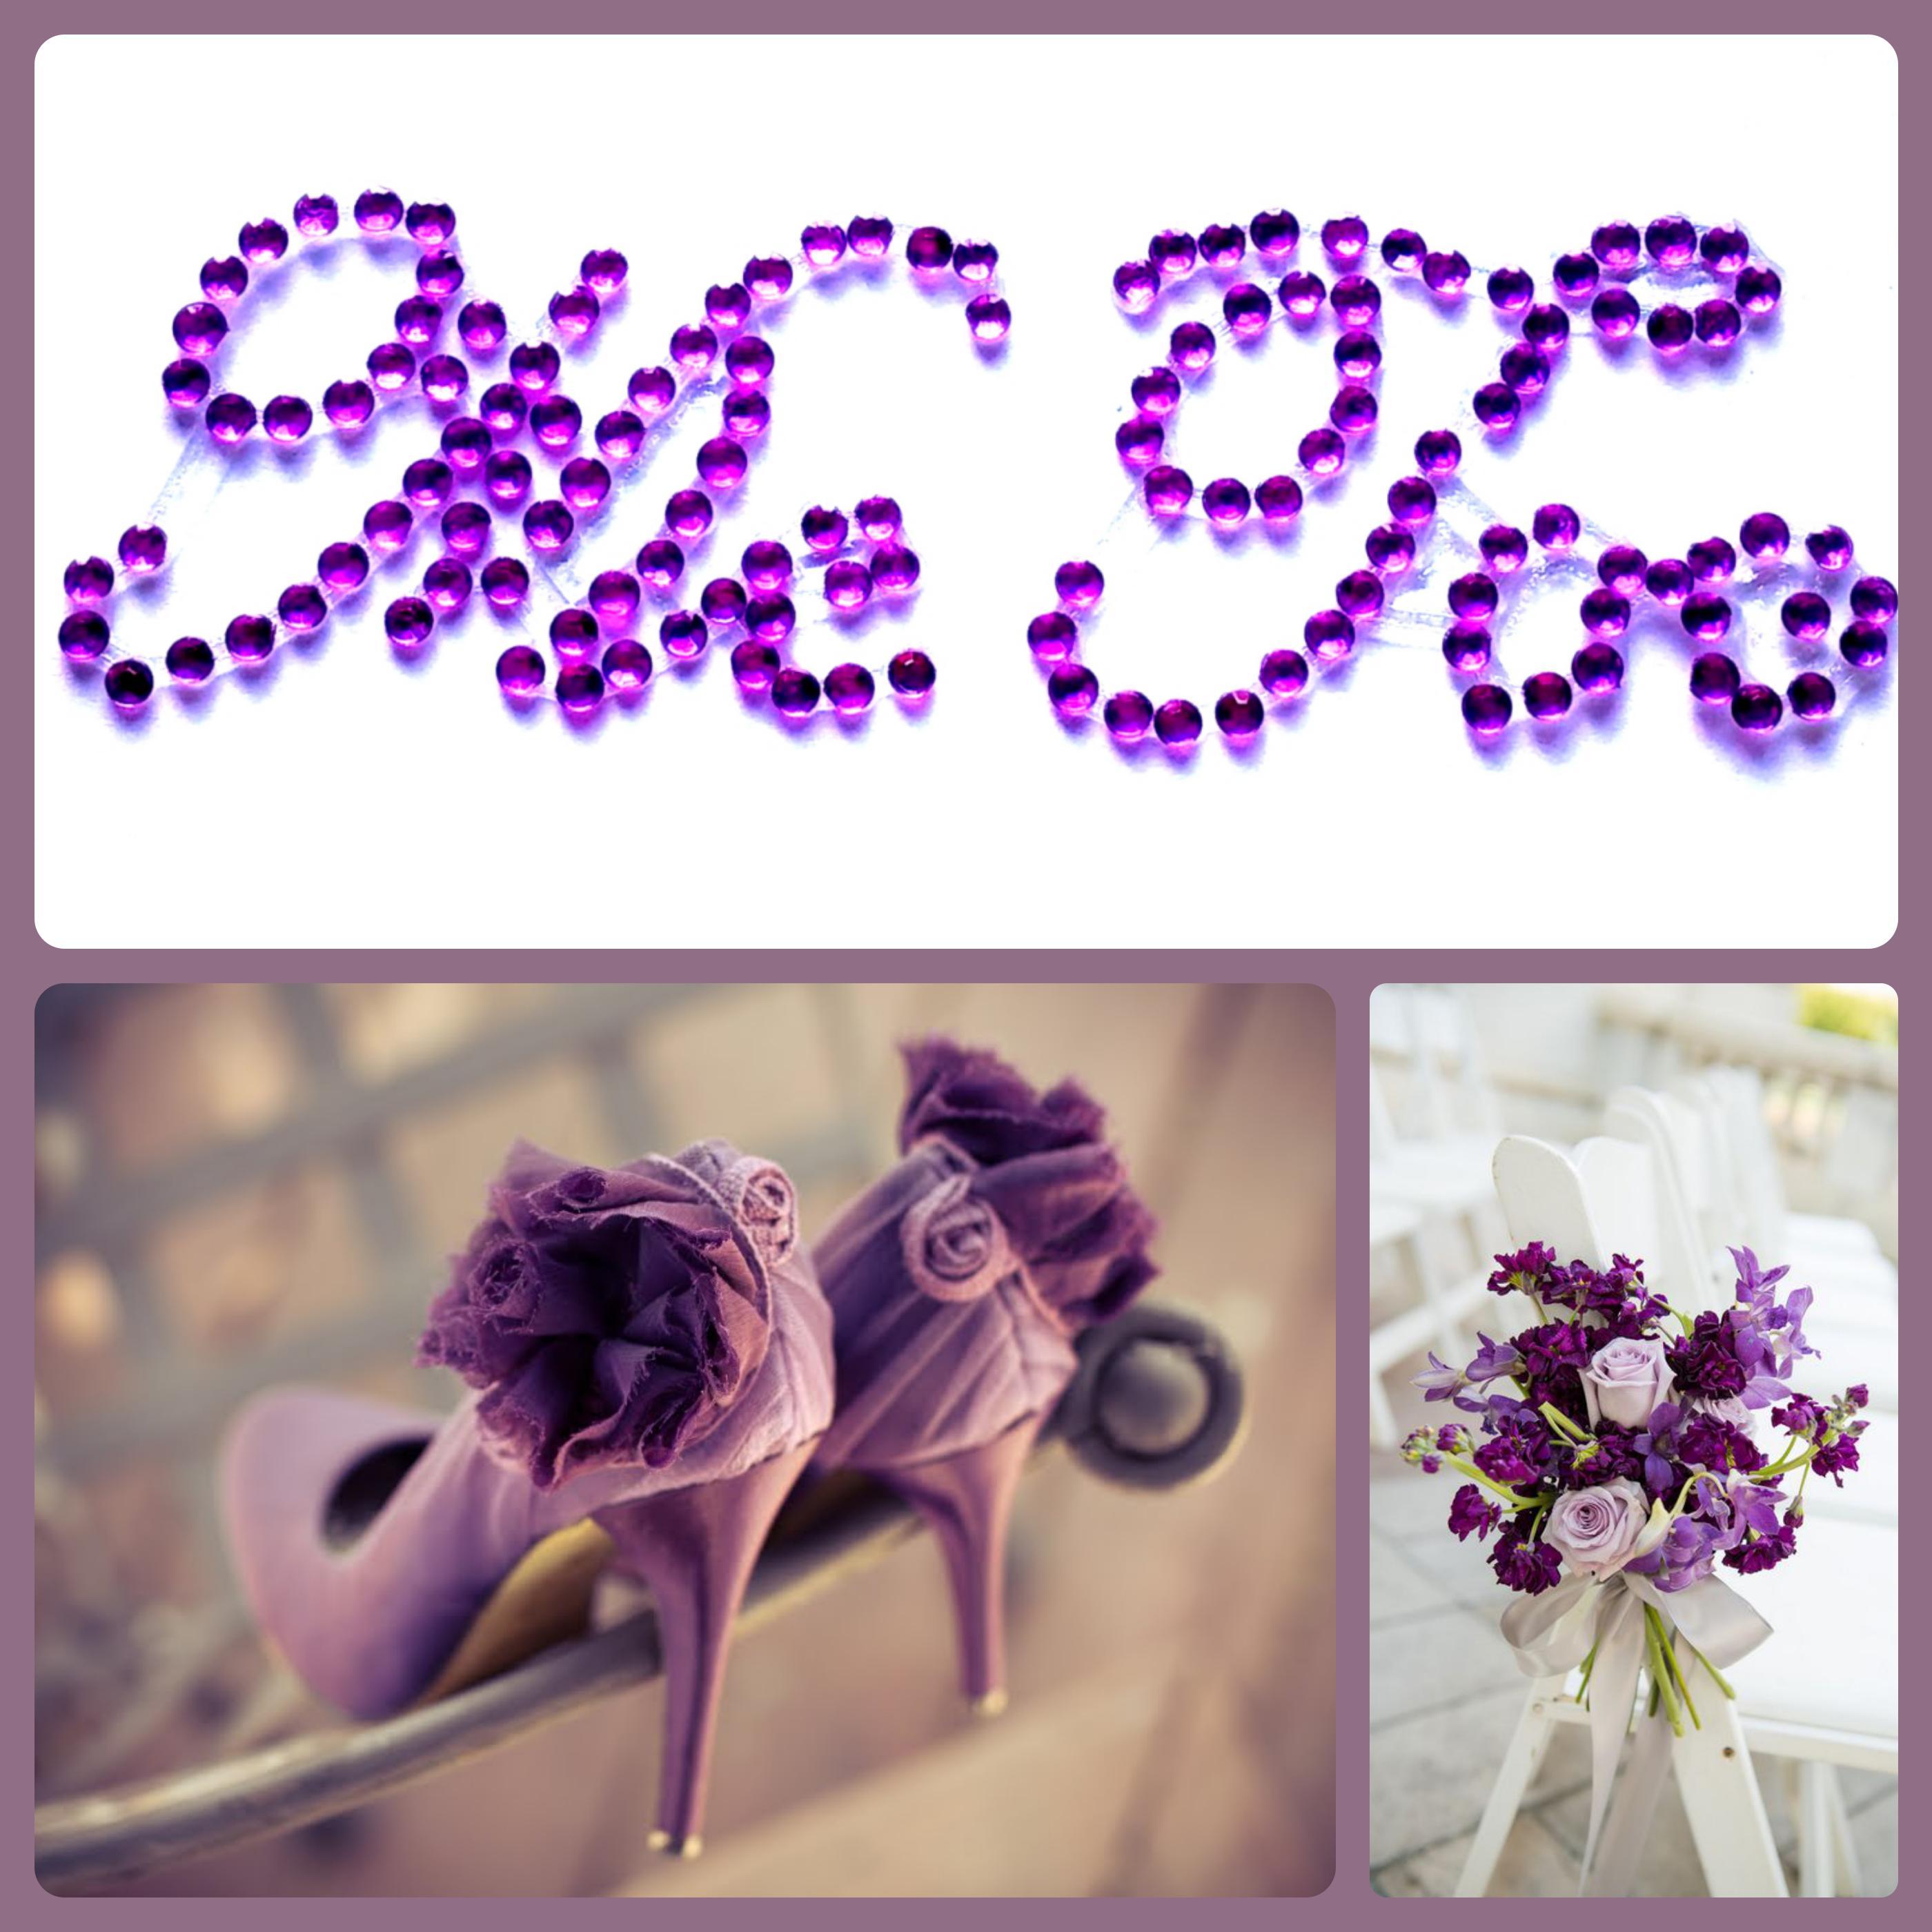 Lipdukai ant patu padu,stikliniu,tauriu,telefono,vestuviniai liptukai2_Fotor_Collage